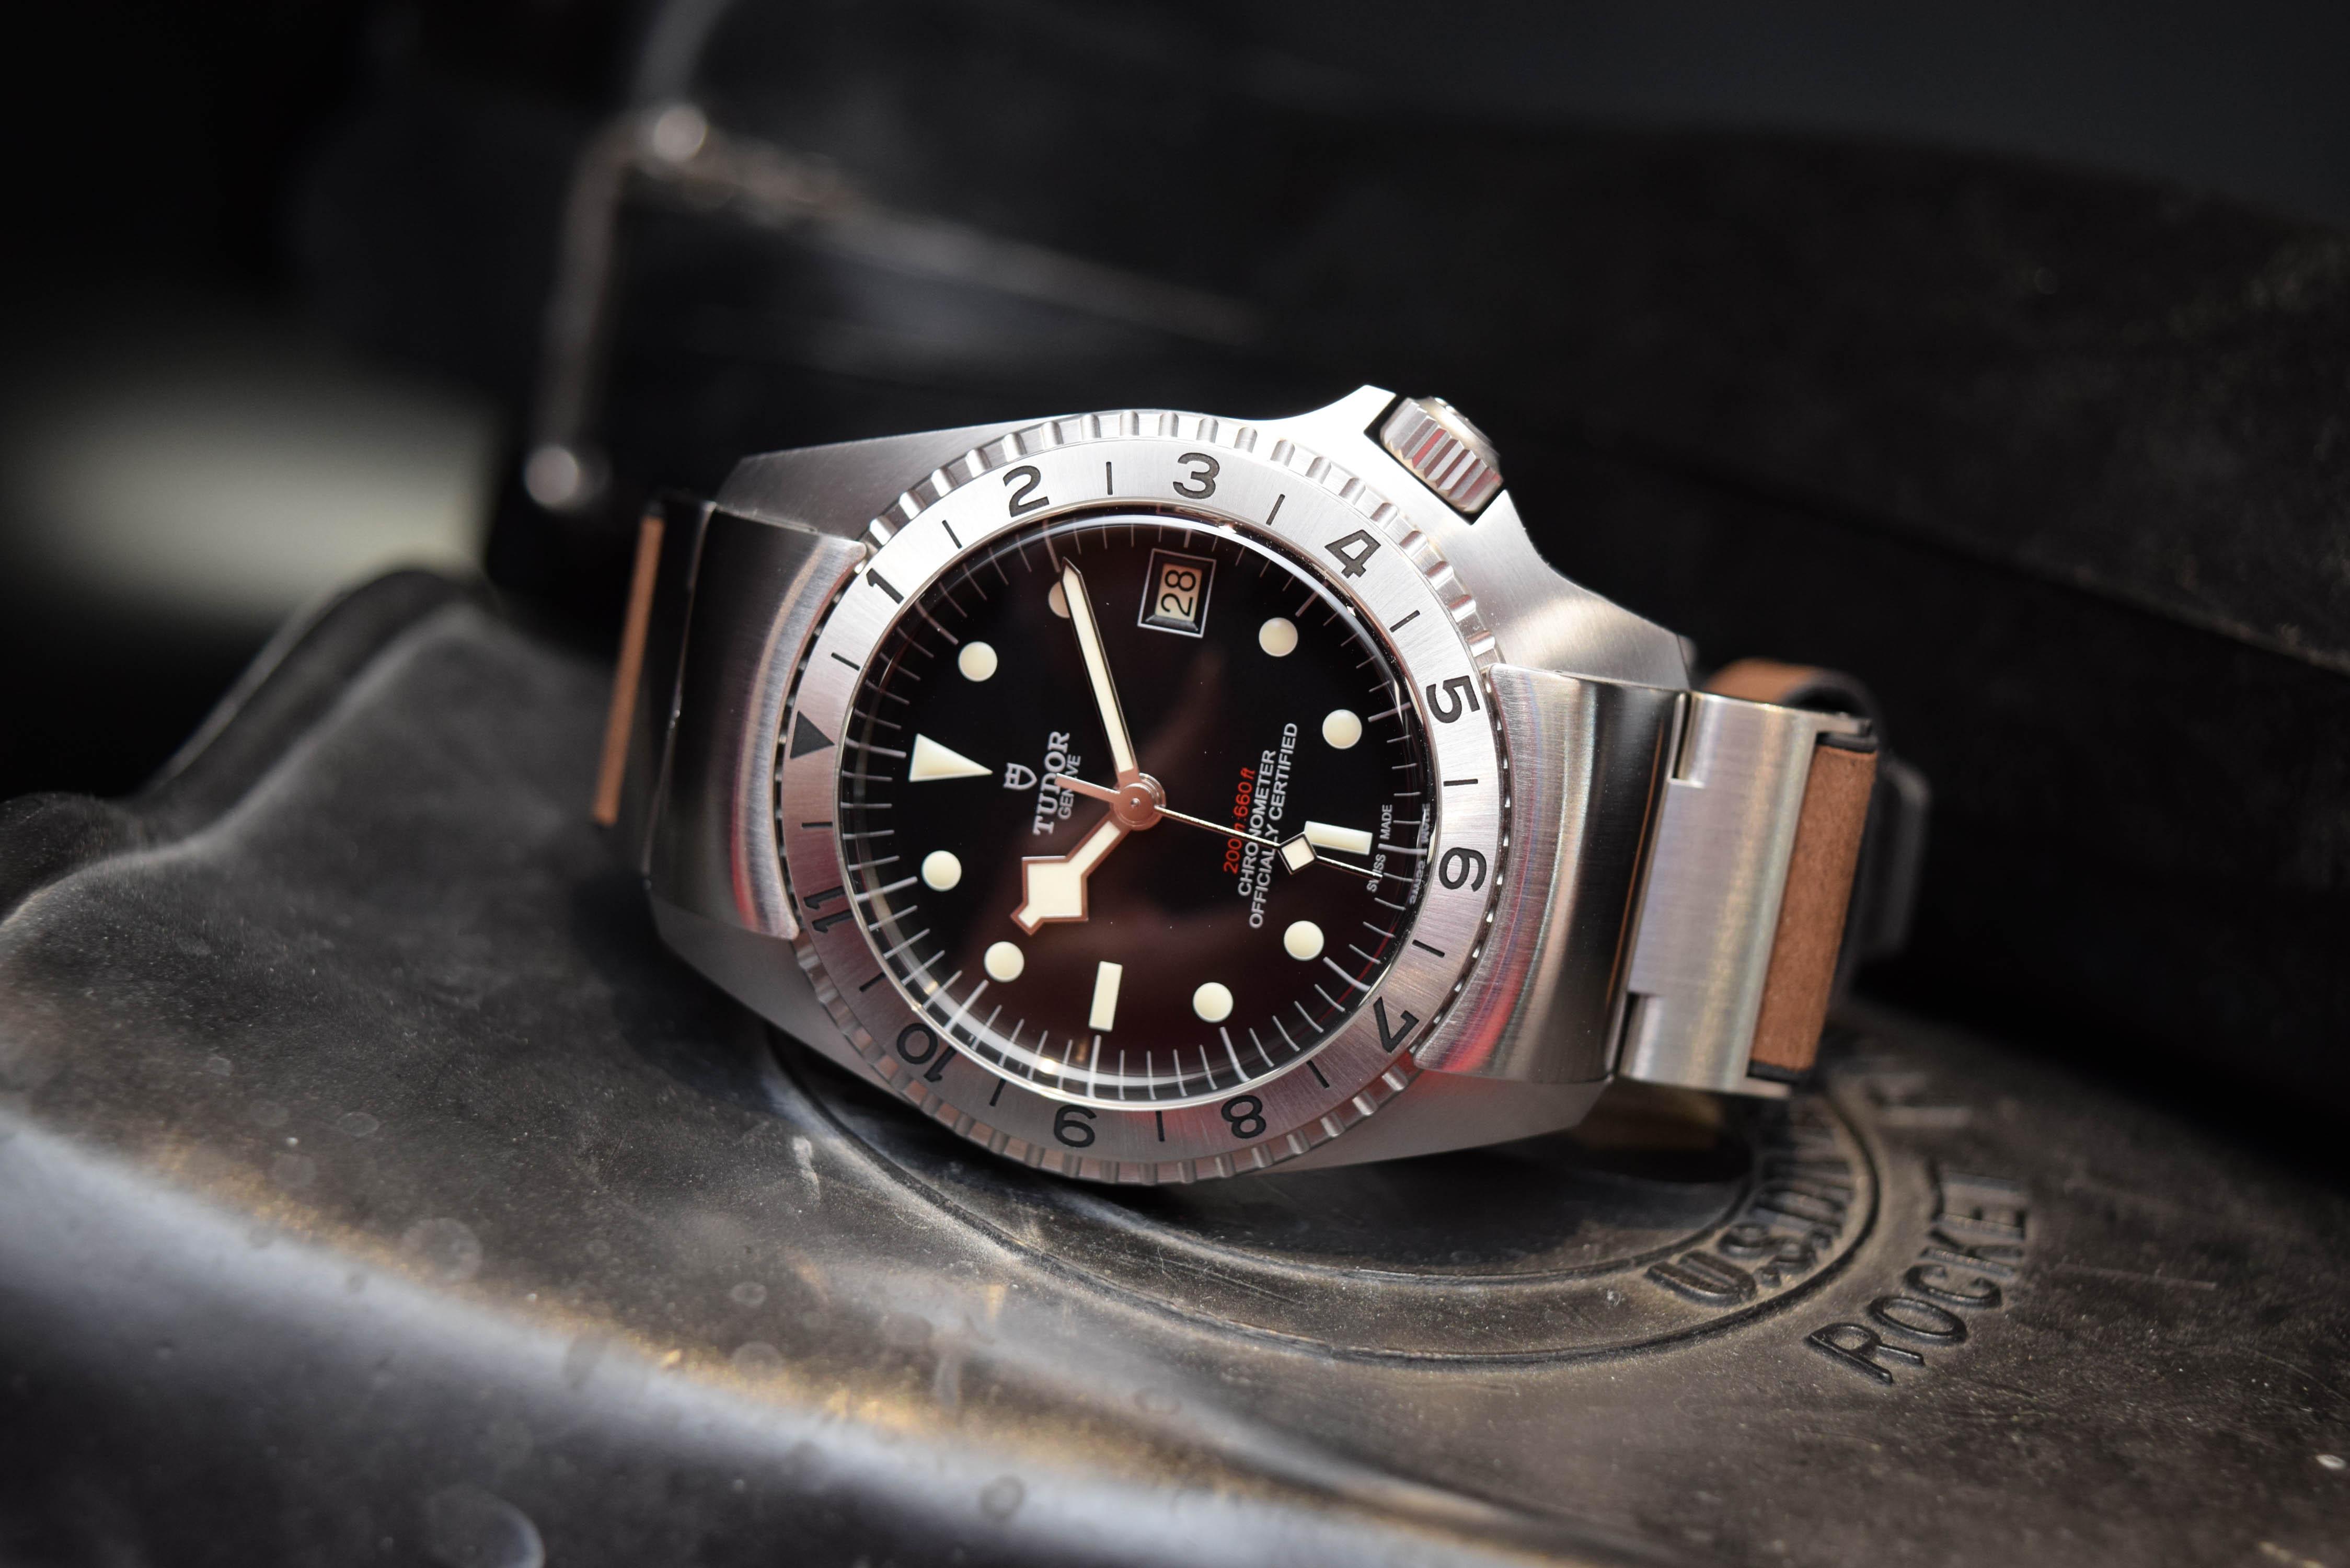 Tudor Black Bay P01 (Live Pics) - Monochrome Watches